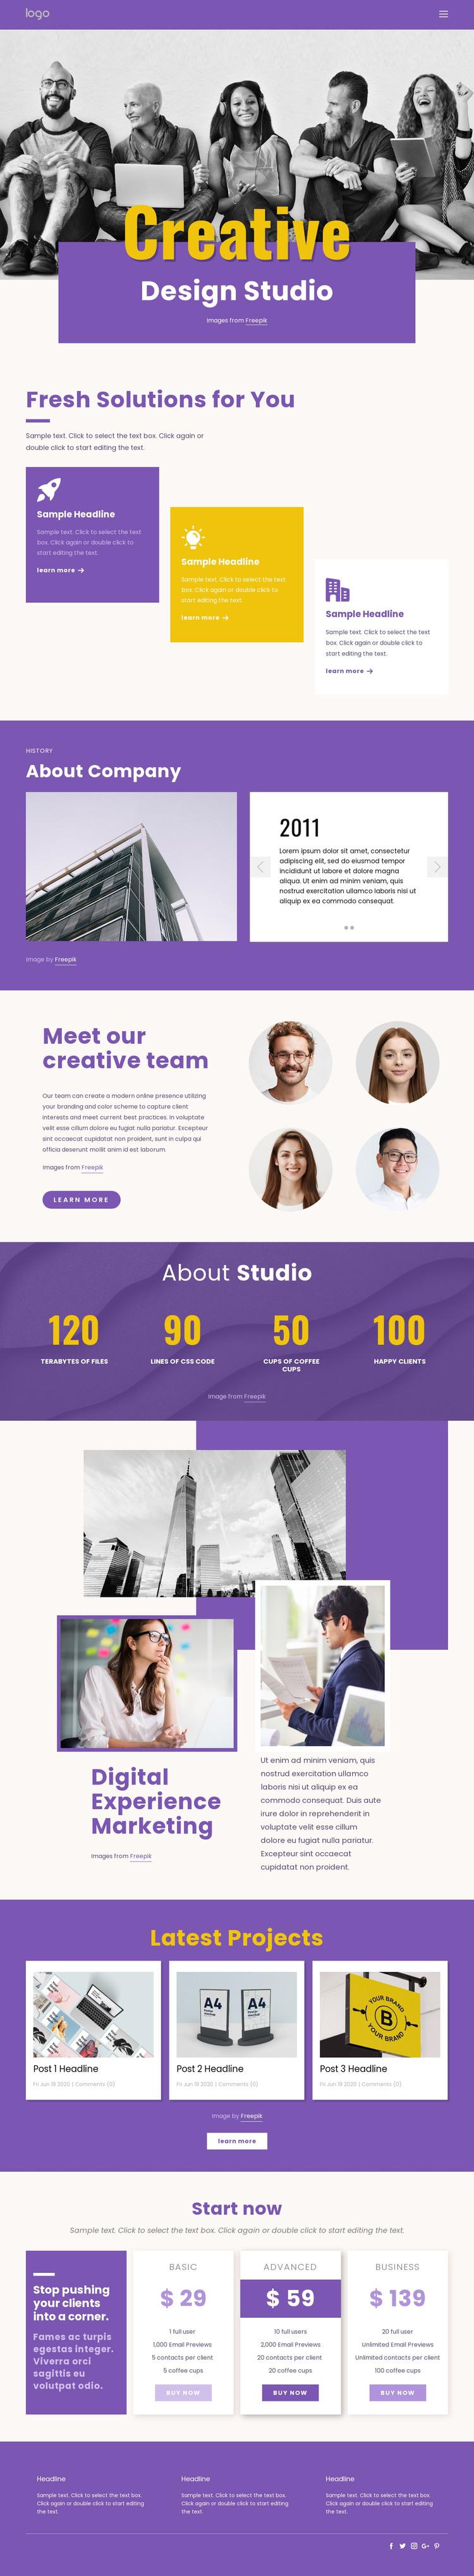 We are creative branding professionals Web Design